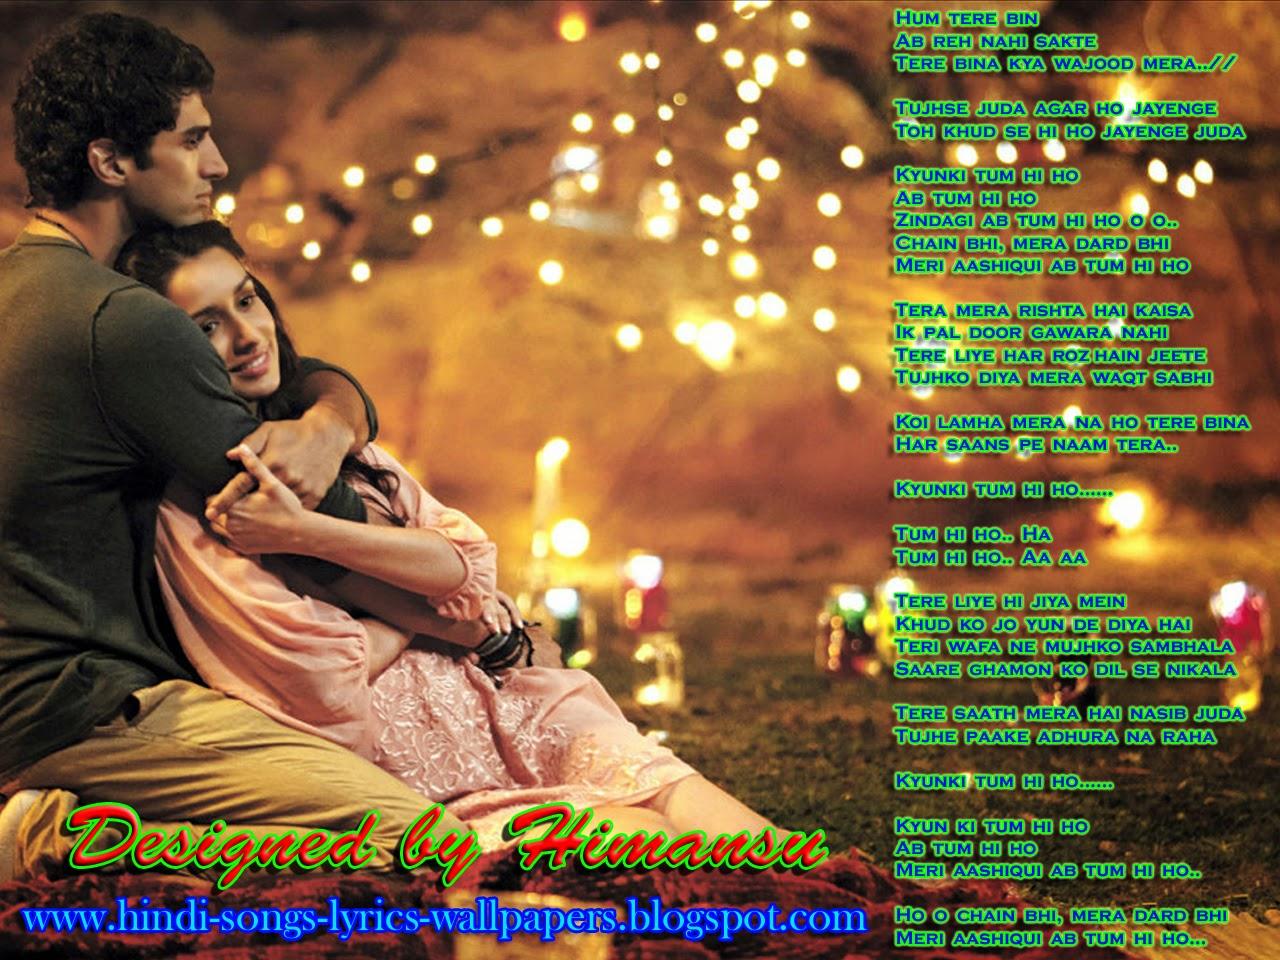 Tum Hi Ho Lyrics - Aashiqui 2 - Indicine